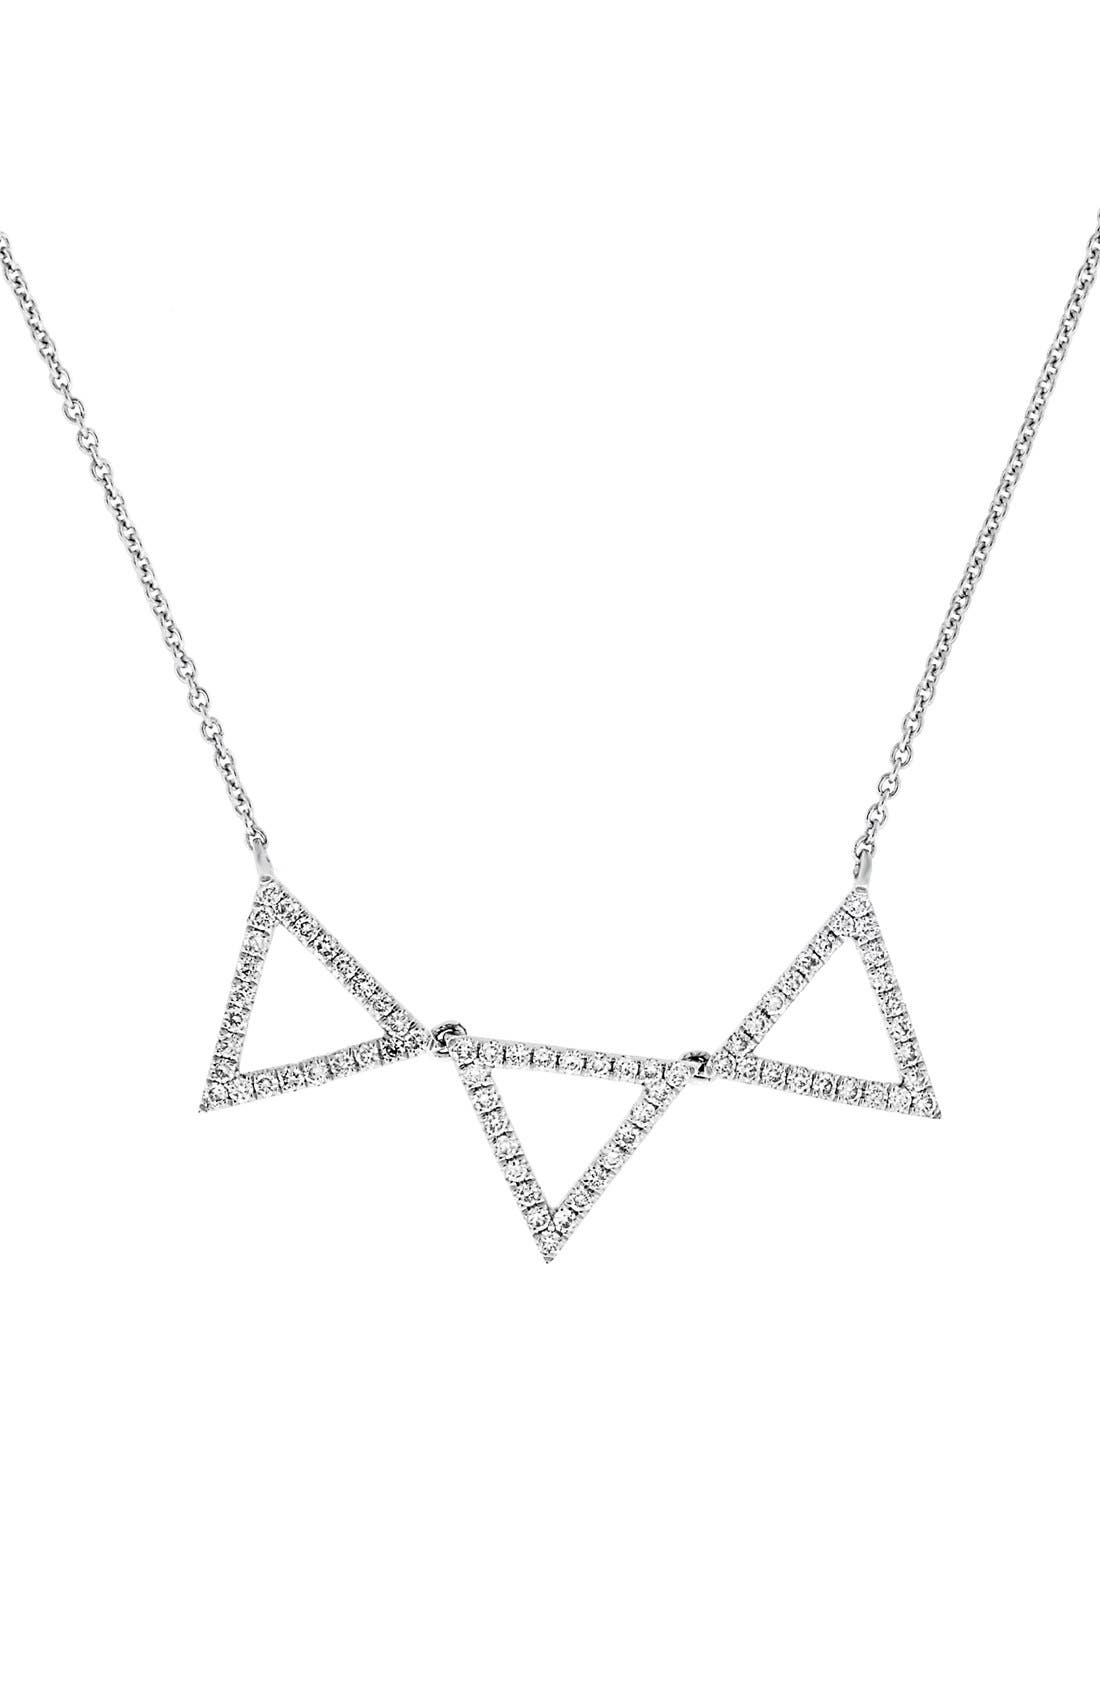 Three Triangle Diamond Pendant Necklace,                             Main thumbnail 1, color,                             WHITE GOLD